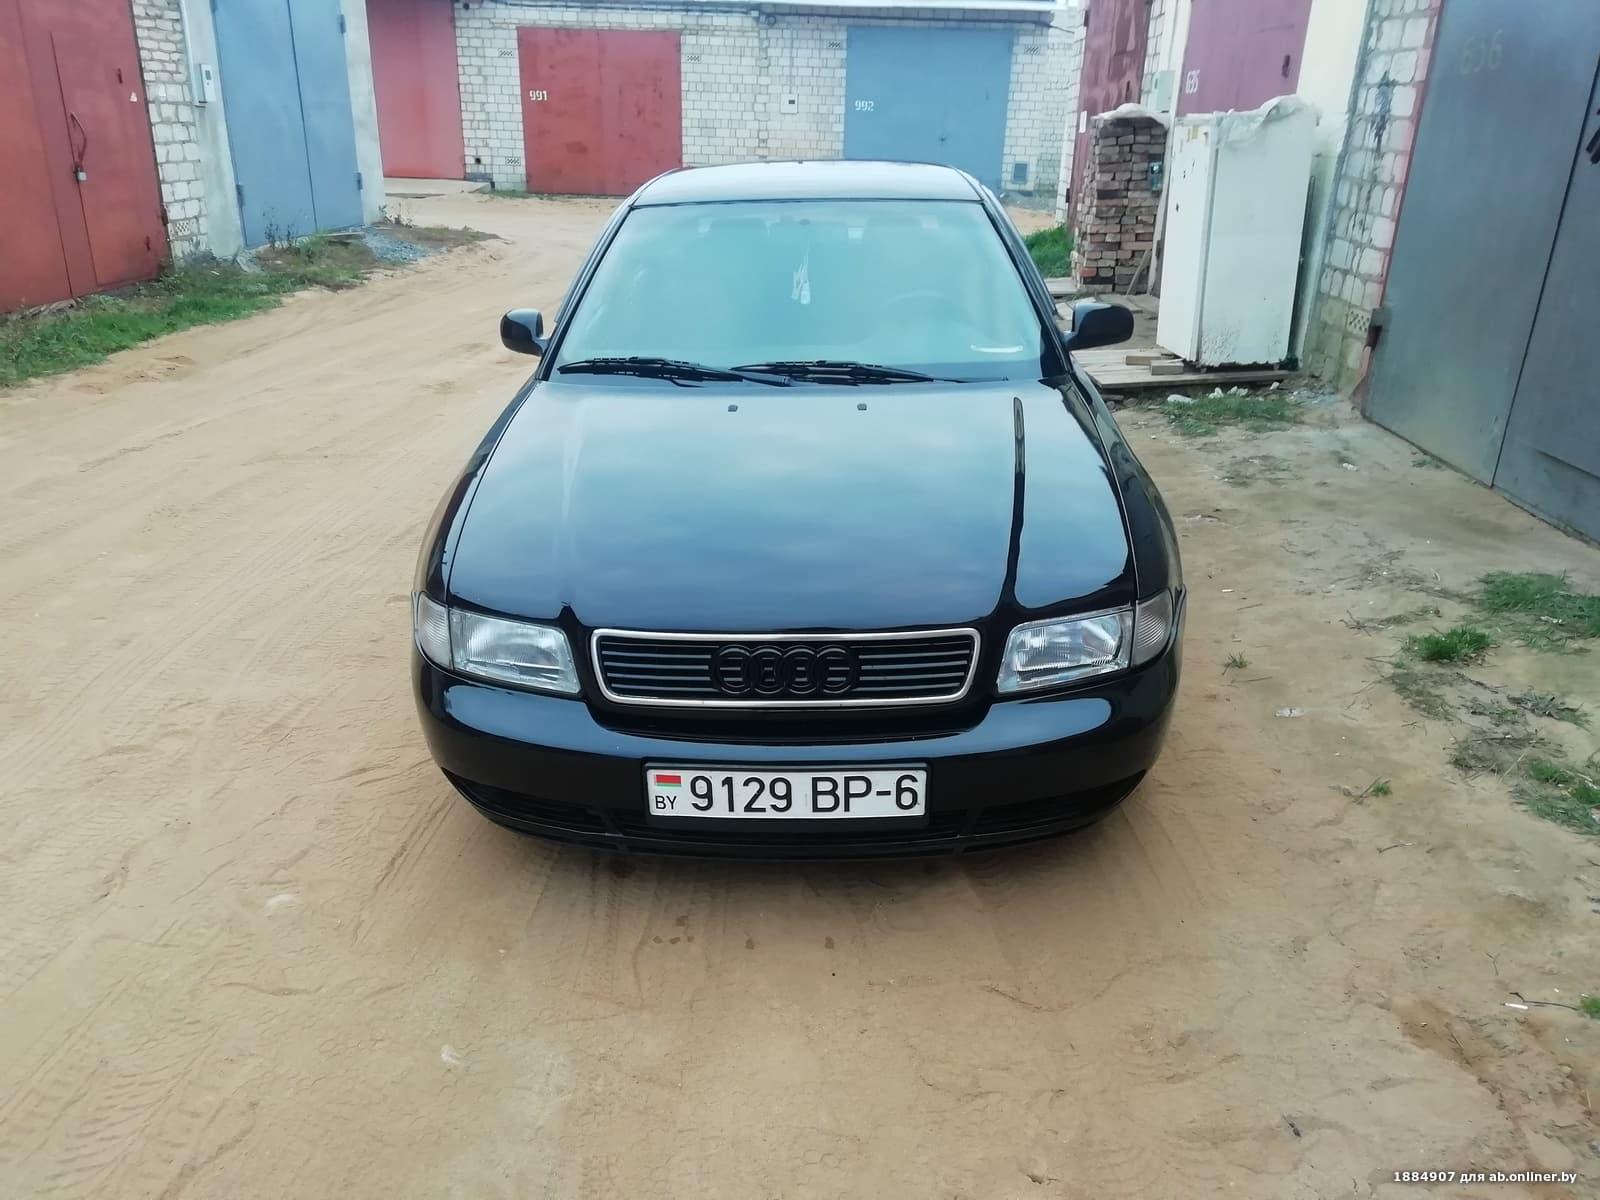 Audi A4 Б5